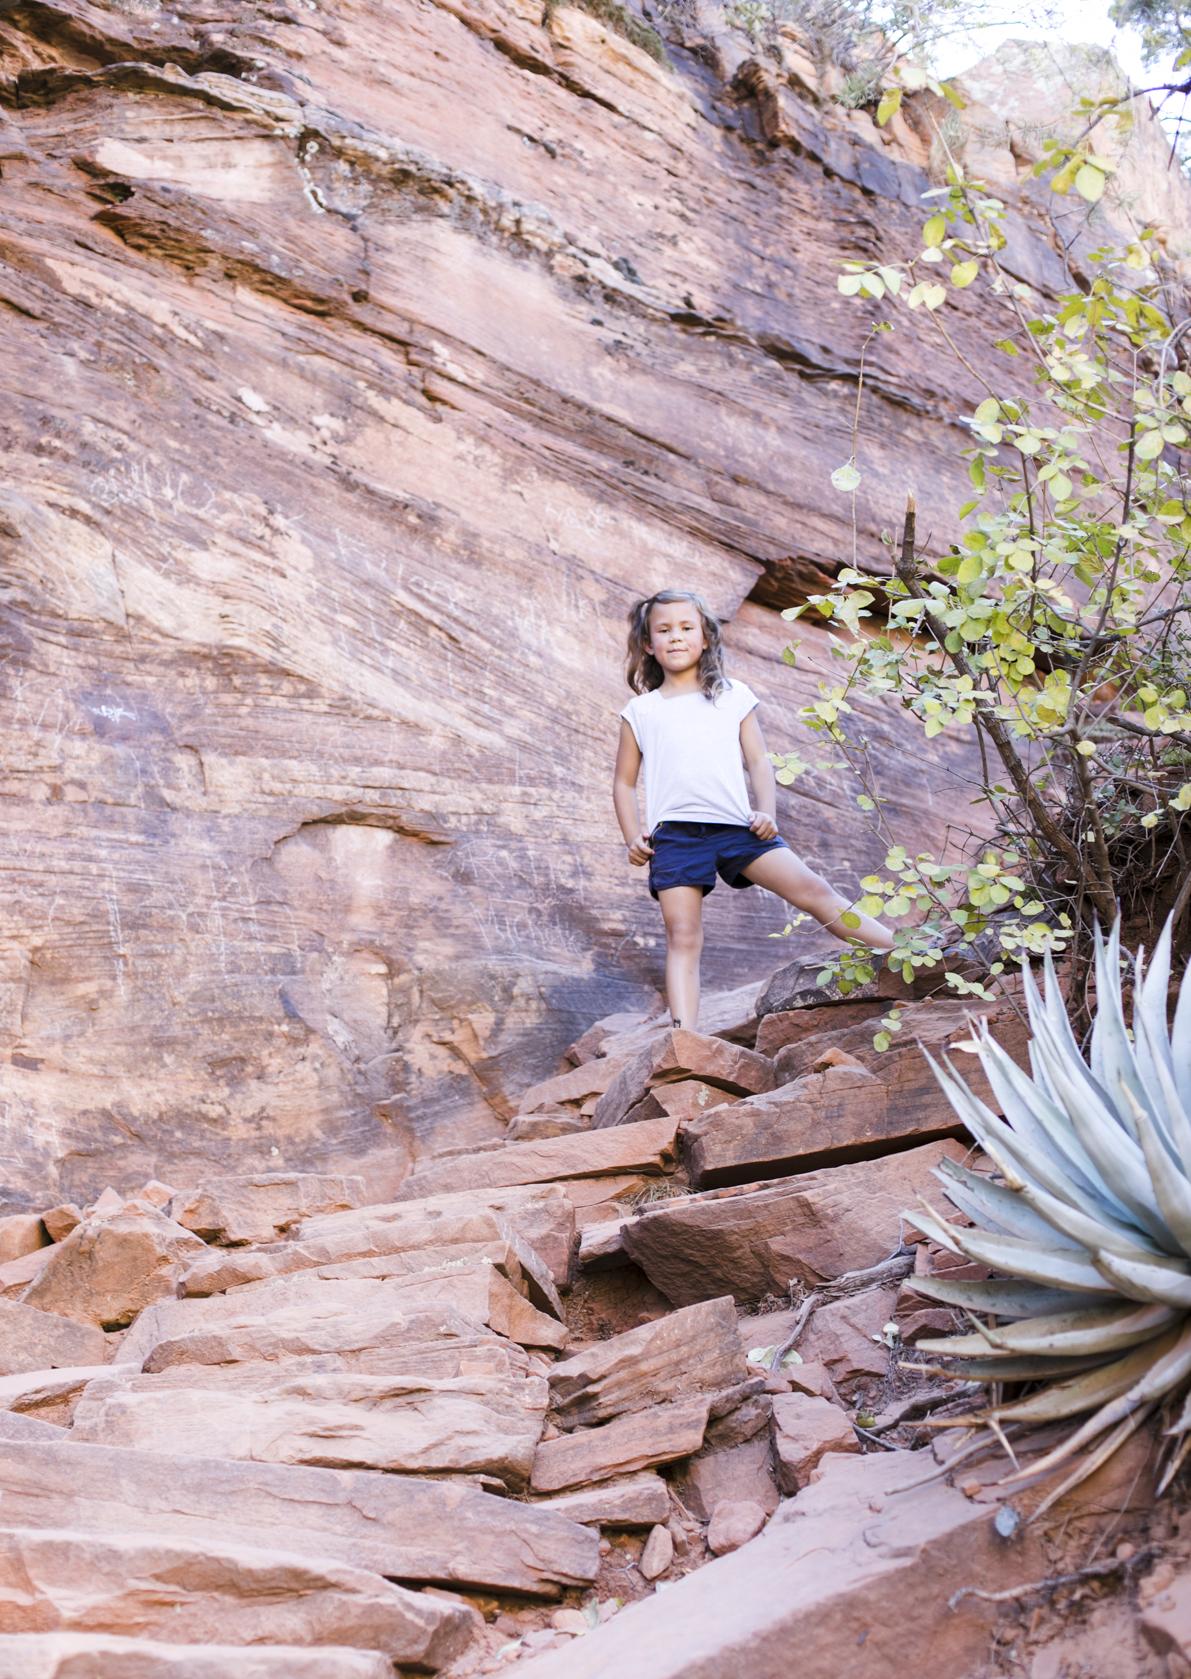 Devil's Bridge Hike Sedona Arizona